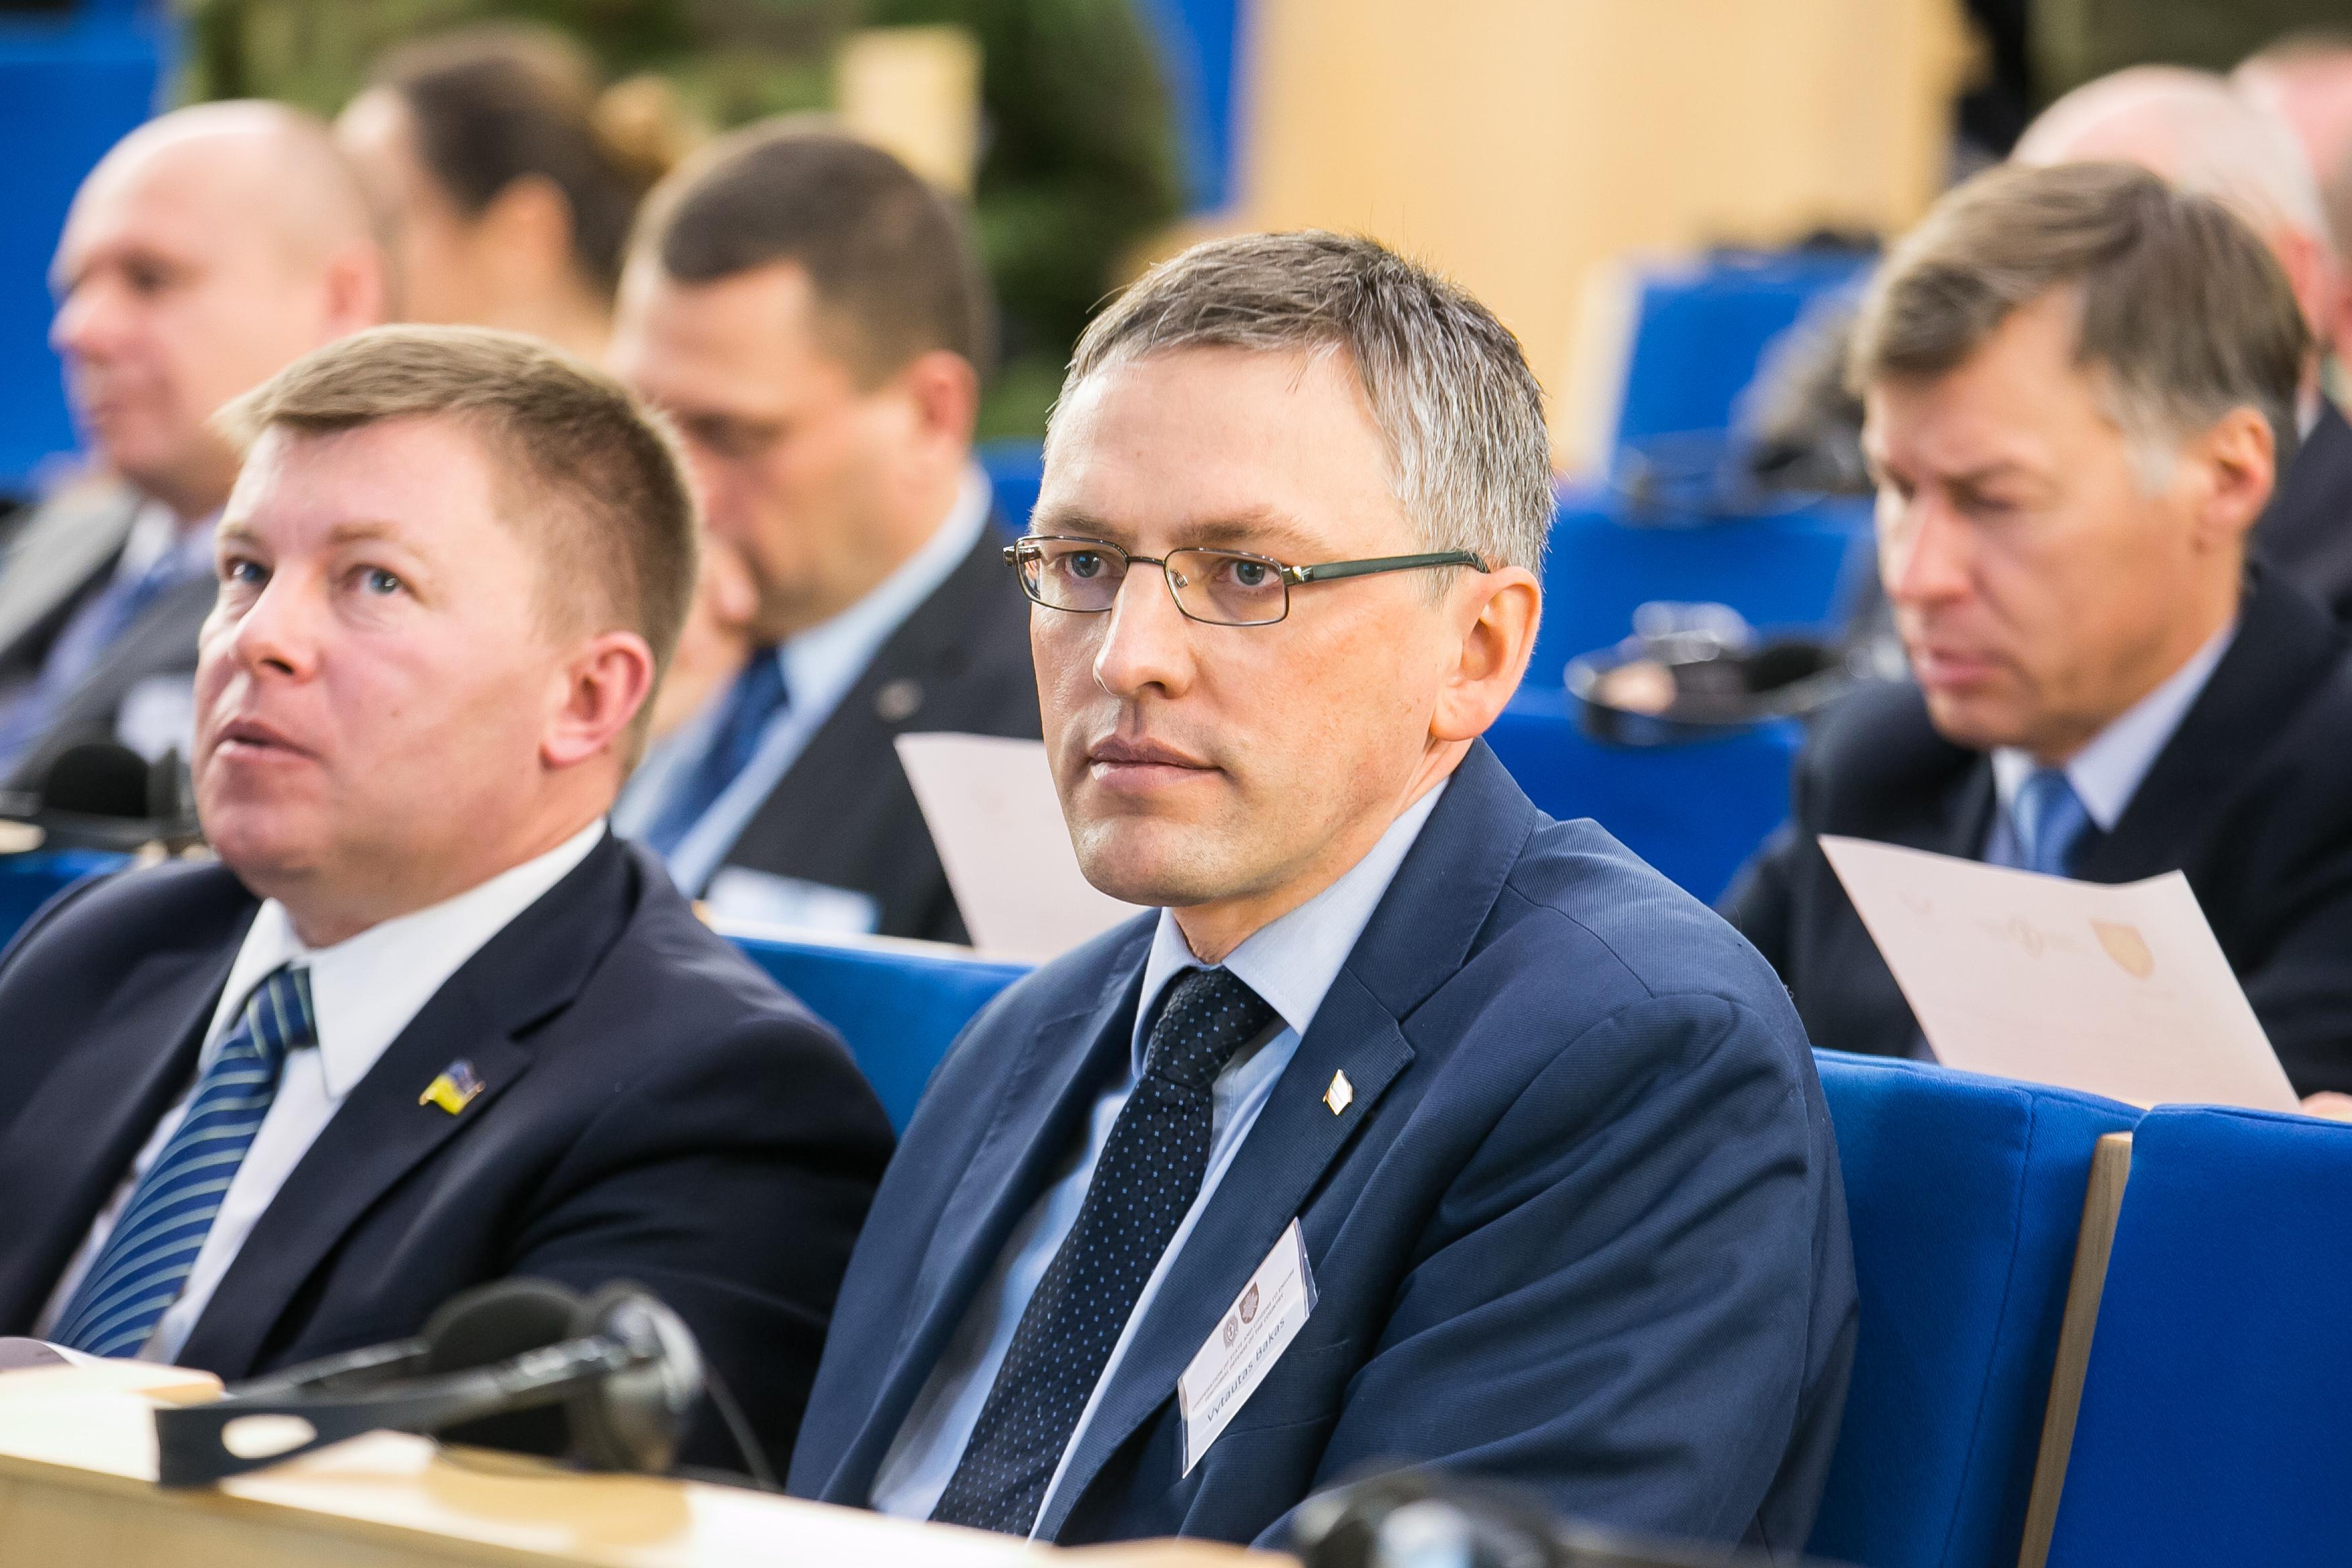 """Žalieji žmogeliukai"" jau Minske. Kas toliau?"